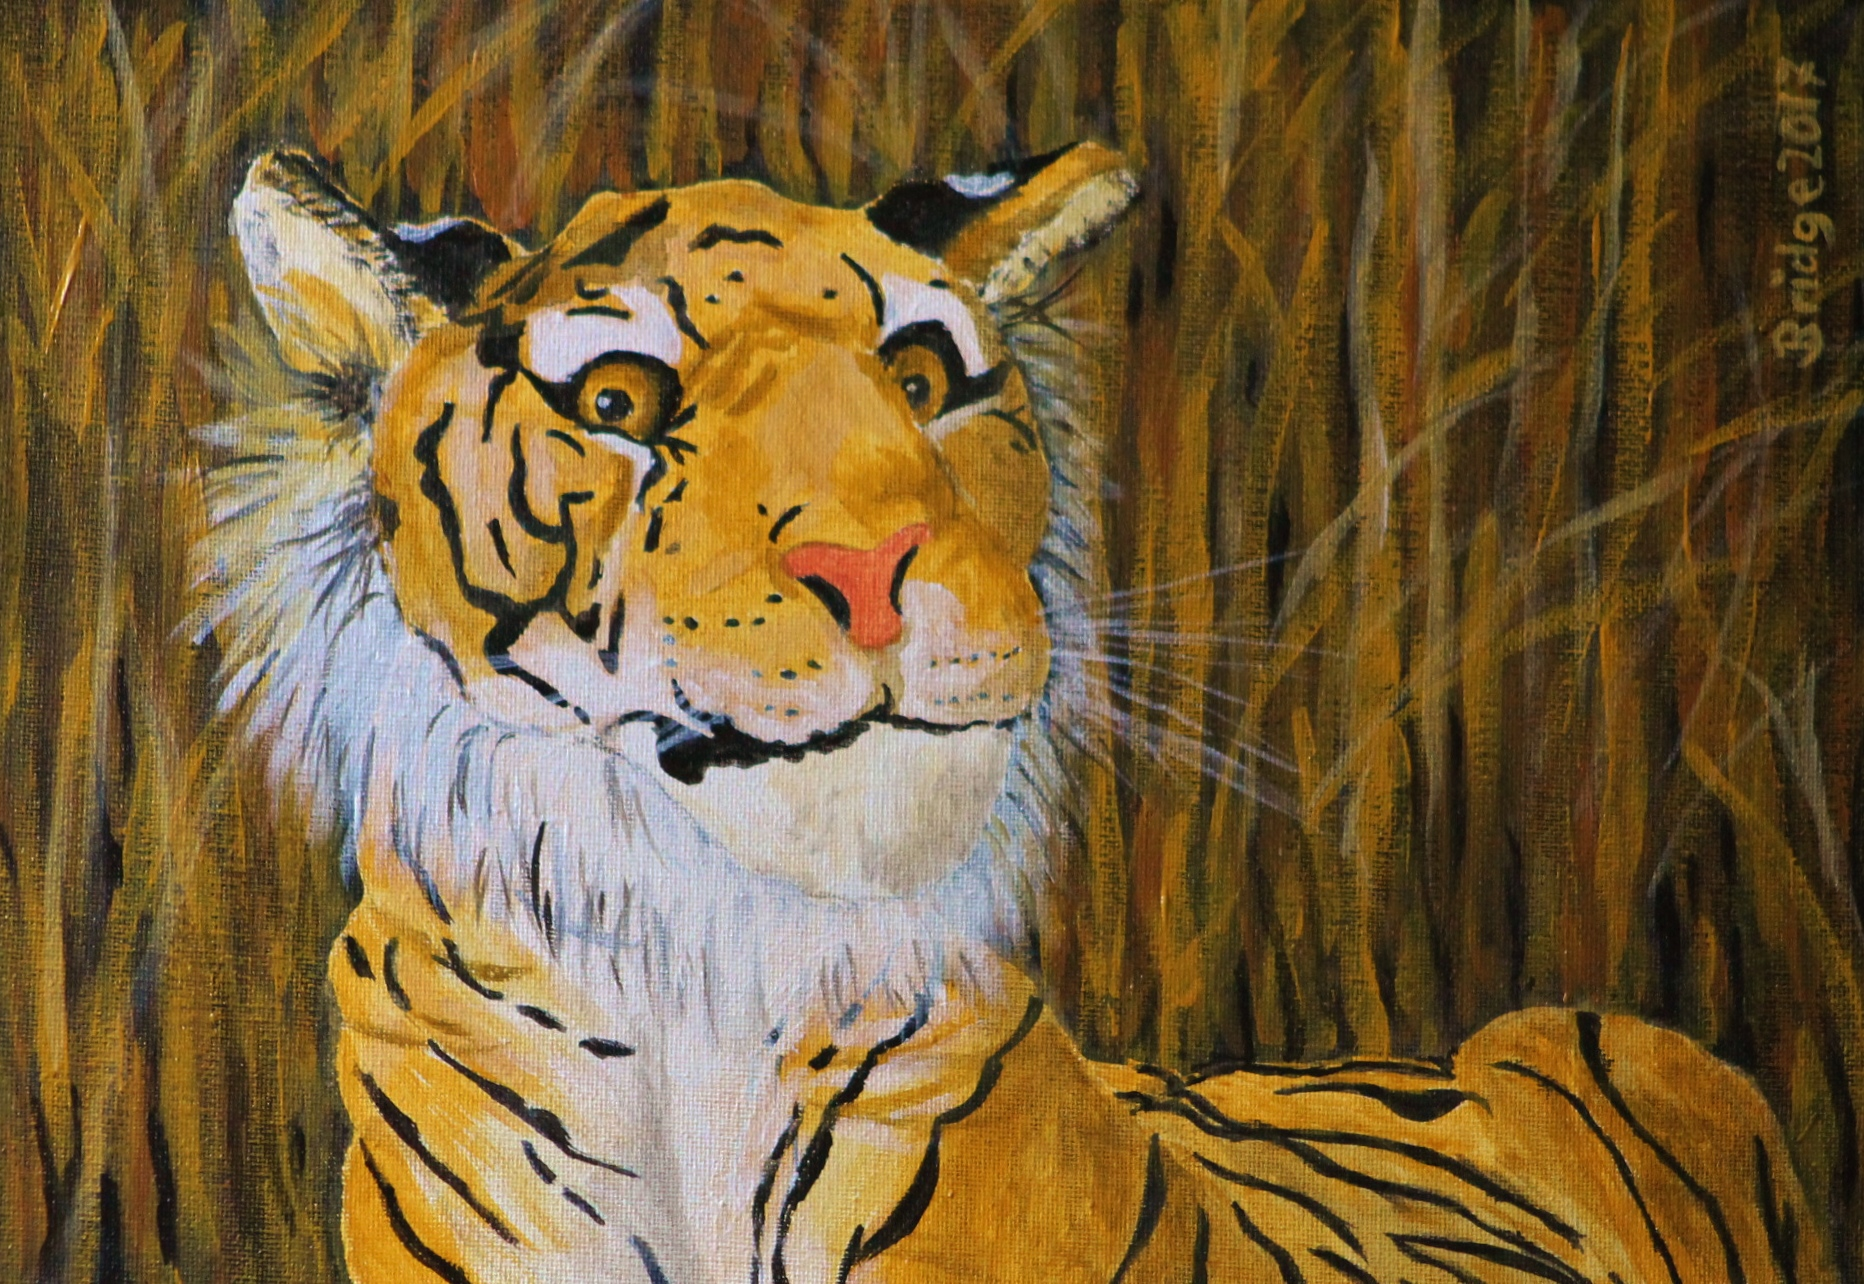 Tiger in the Grass, ArtHenning